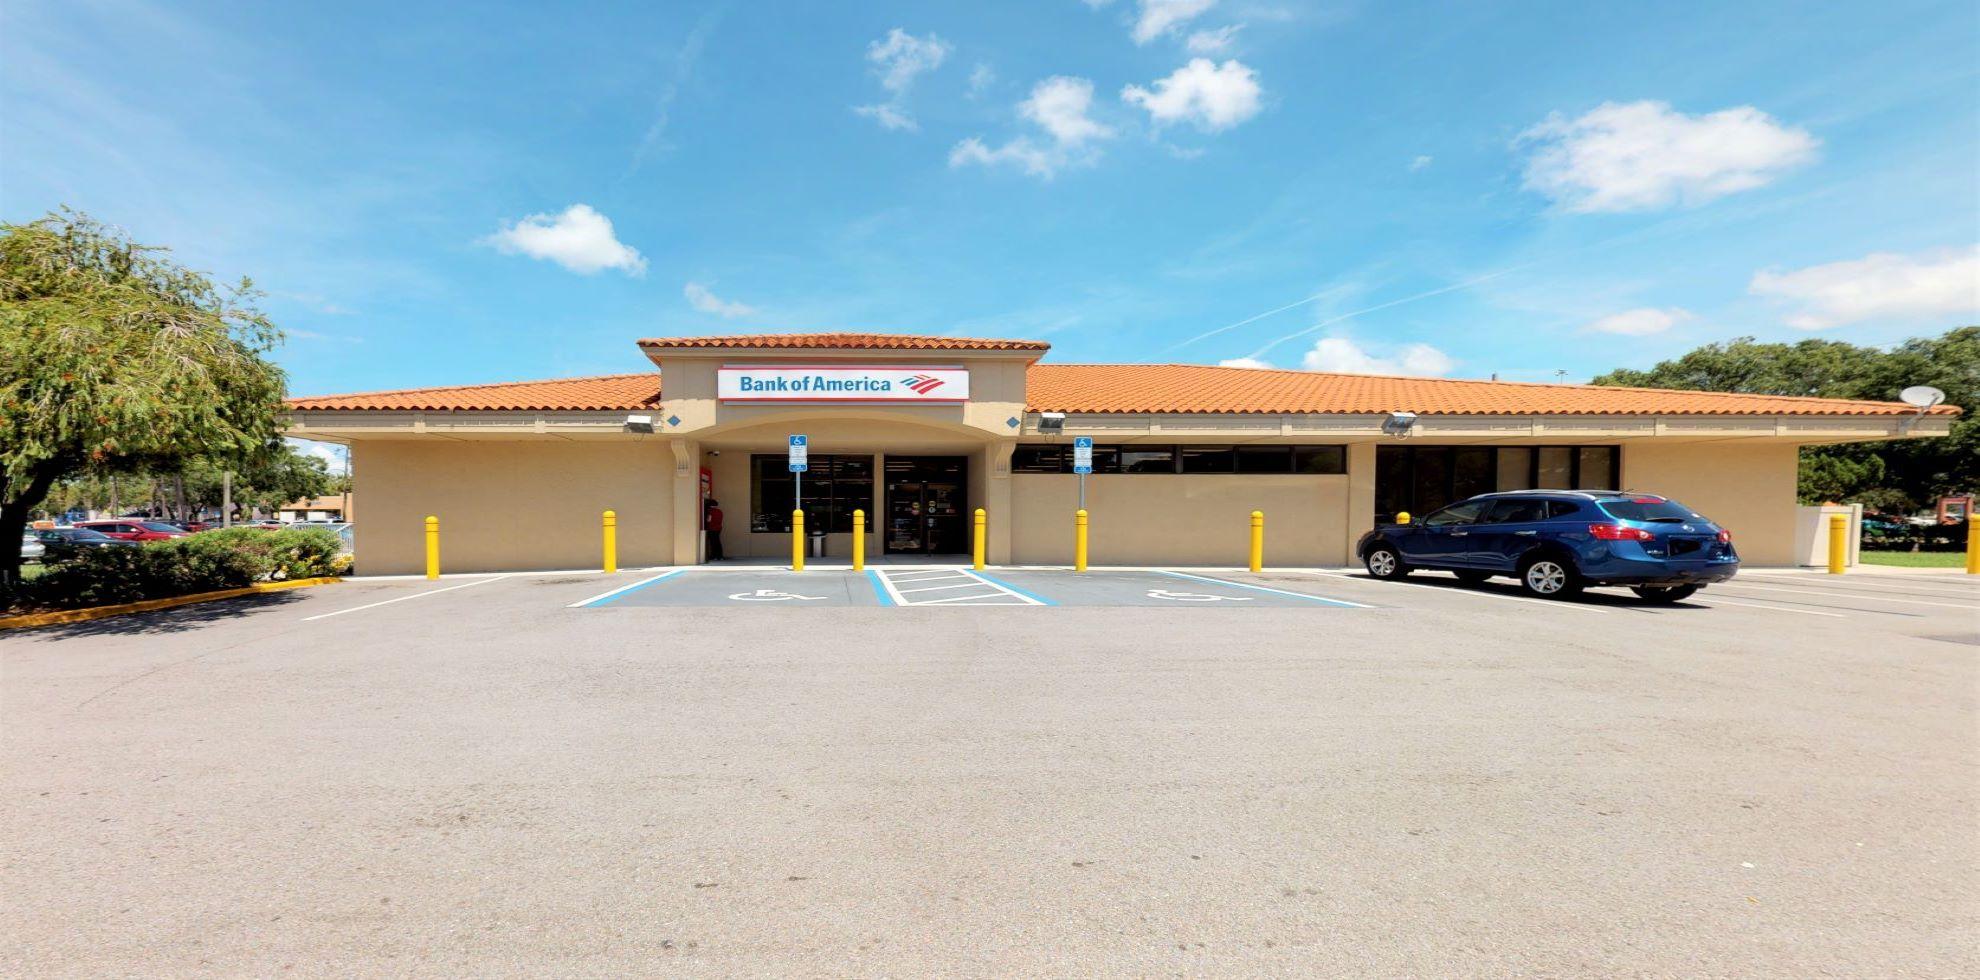 Bank of America financial center with drive-thru ATM   3930 Cattlemen Rd, Sarasota, FL 34233